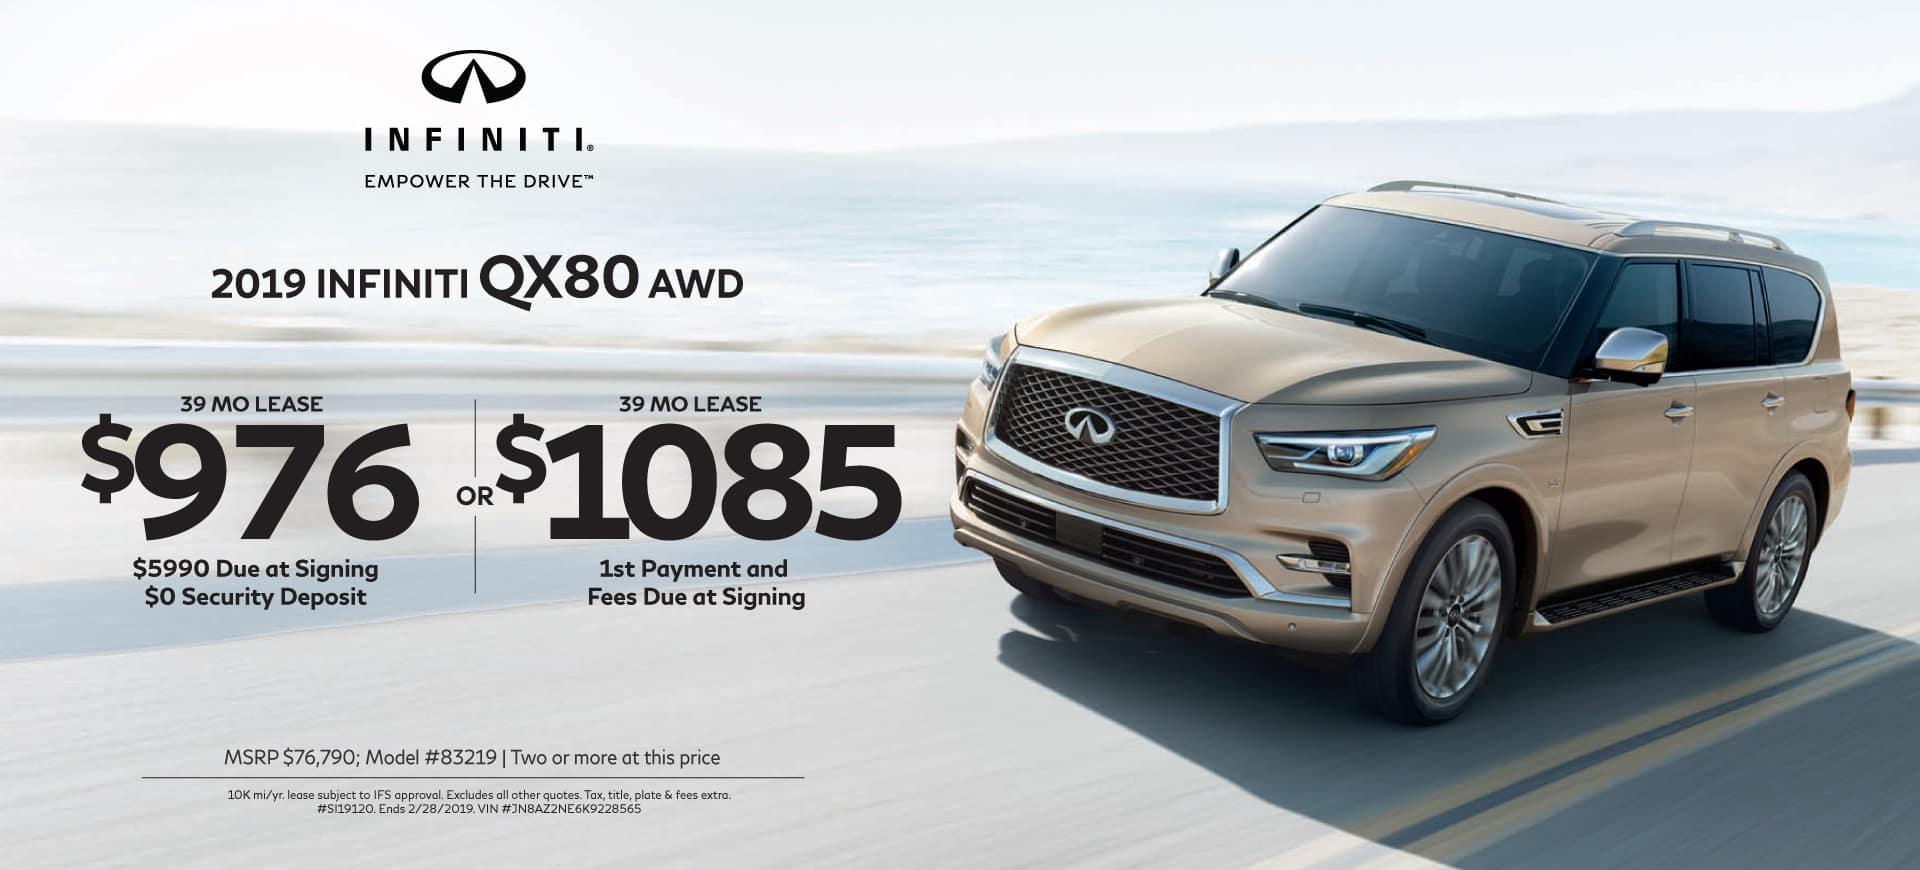 2018 INFINITI specials QX80 AWD